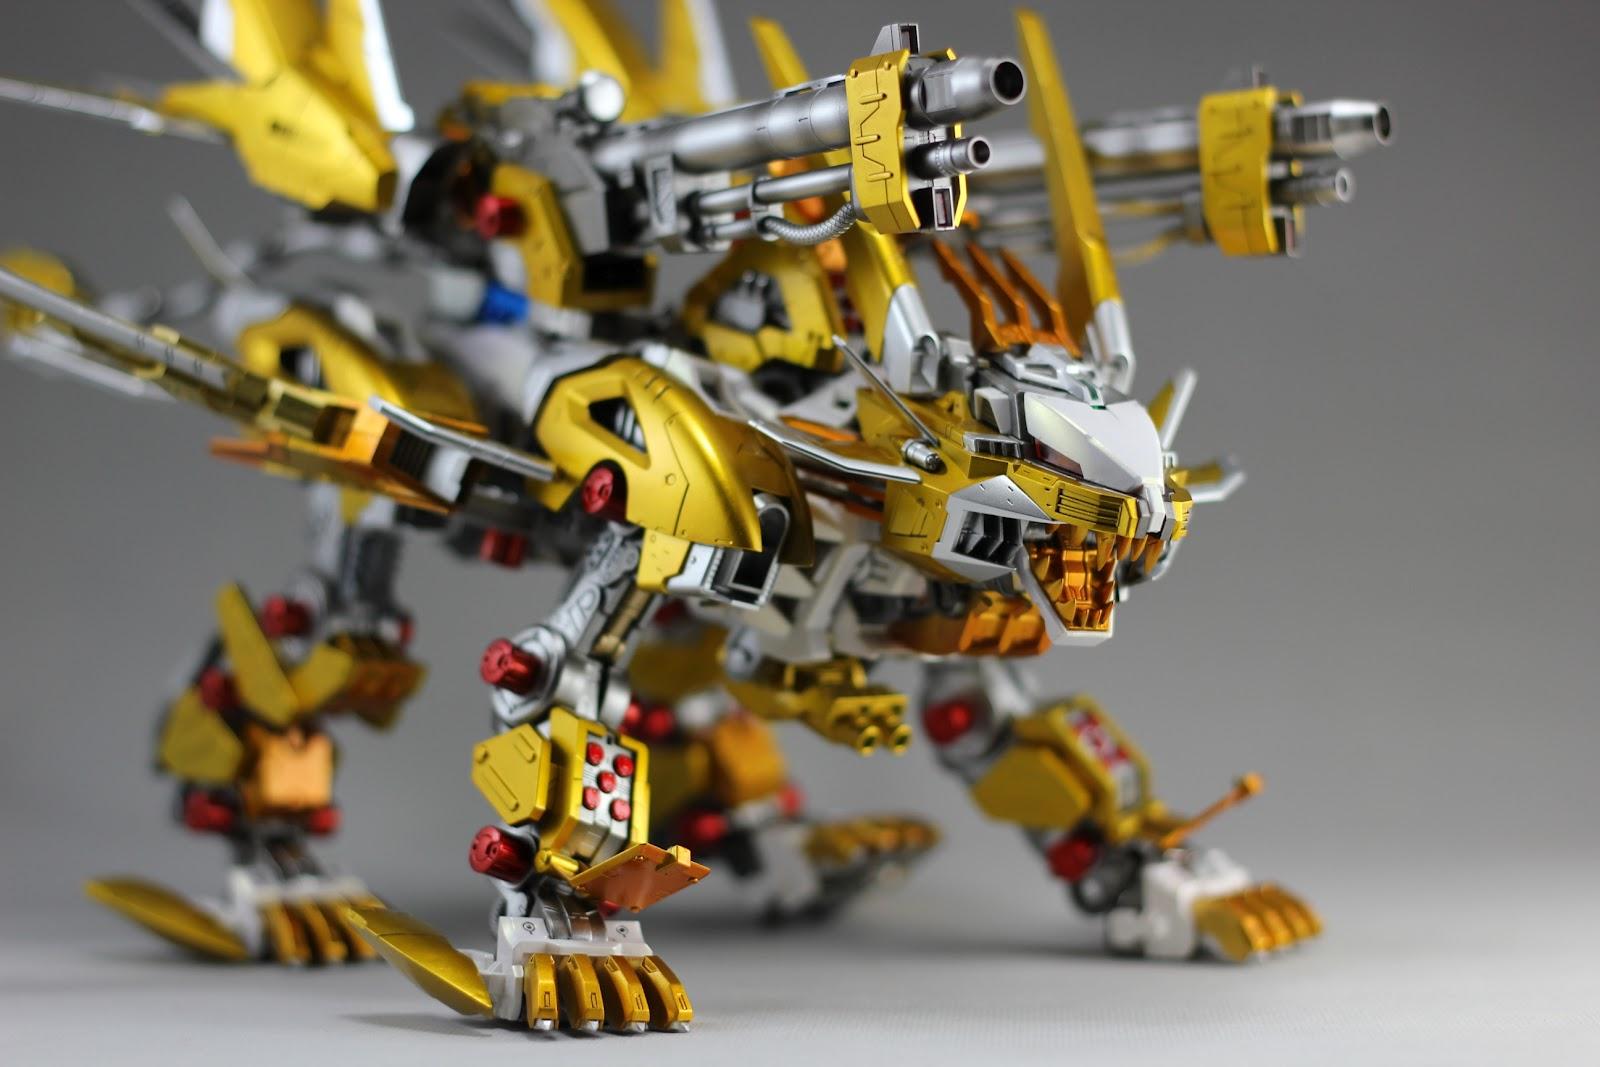 Zoids Liger Zero Jager Zoids rz 041 Liger Zero Jager